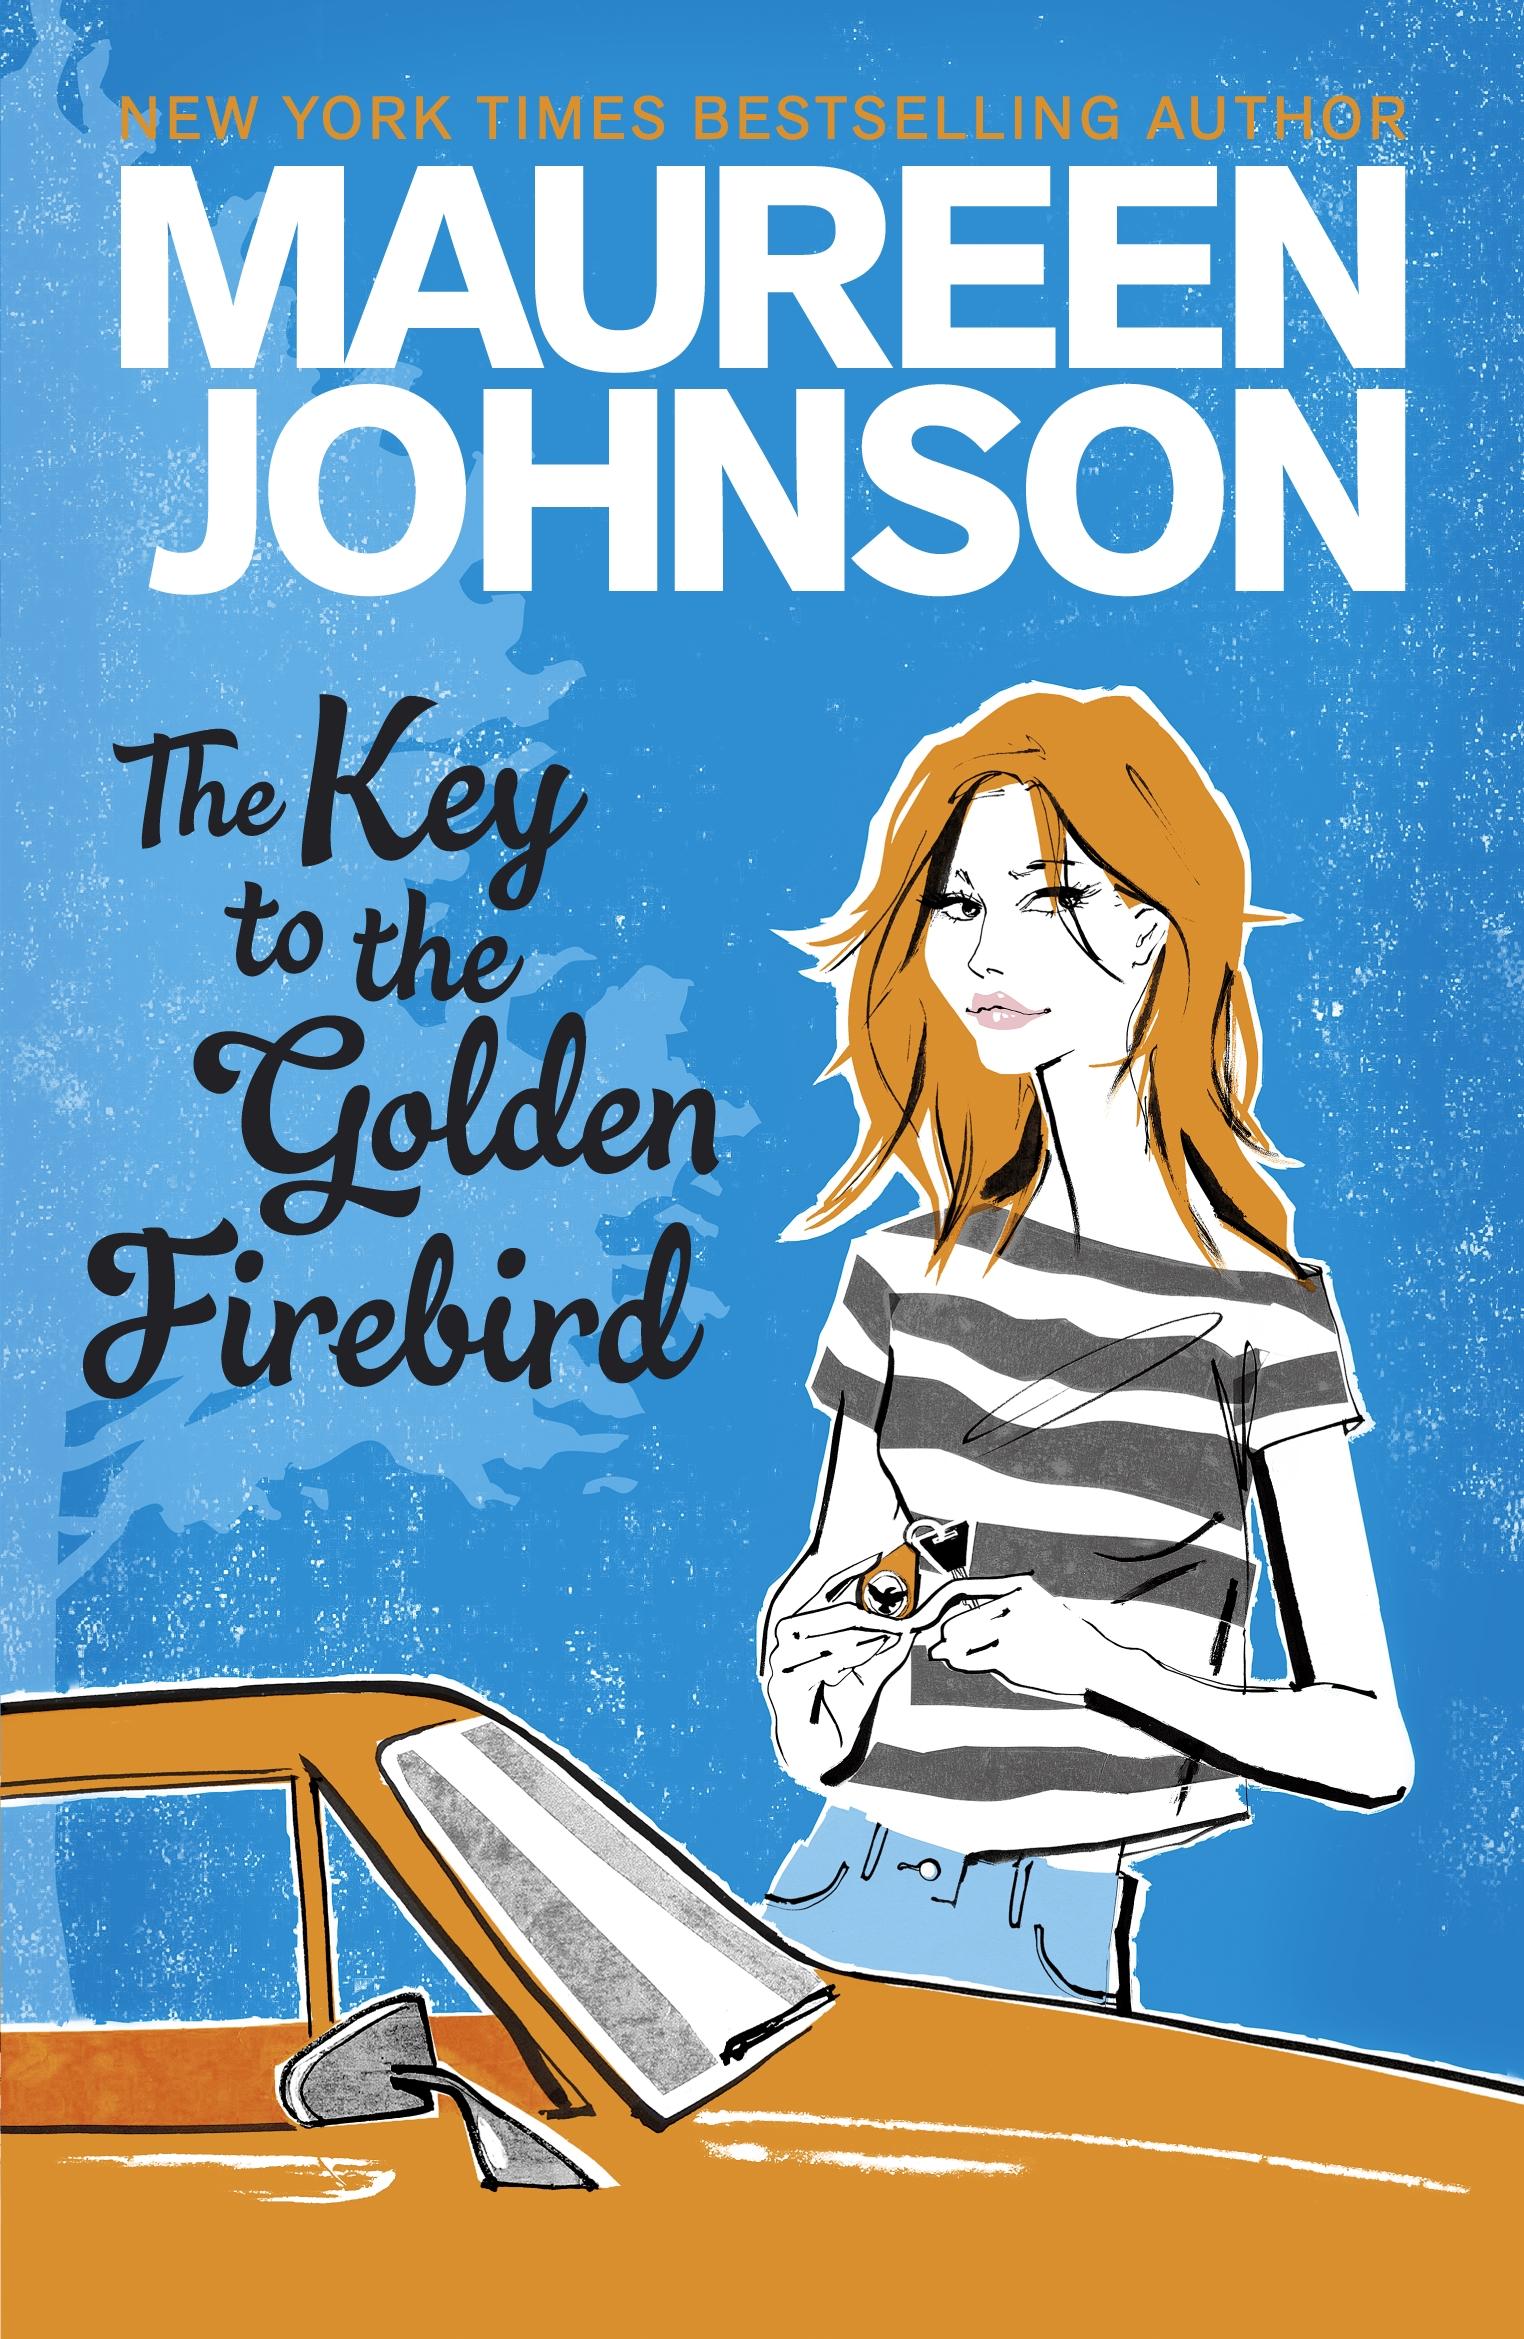 The Key To The Golden Firebird by Maureen Johnson